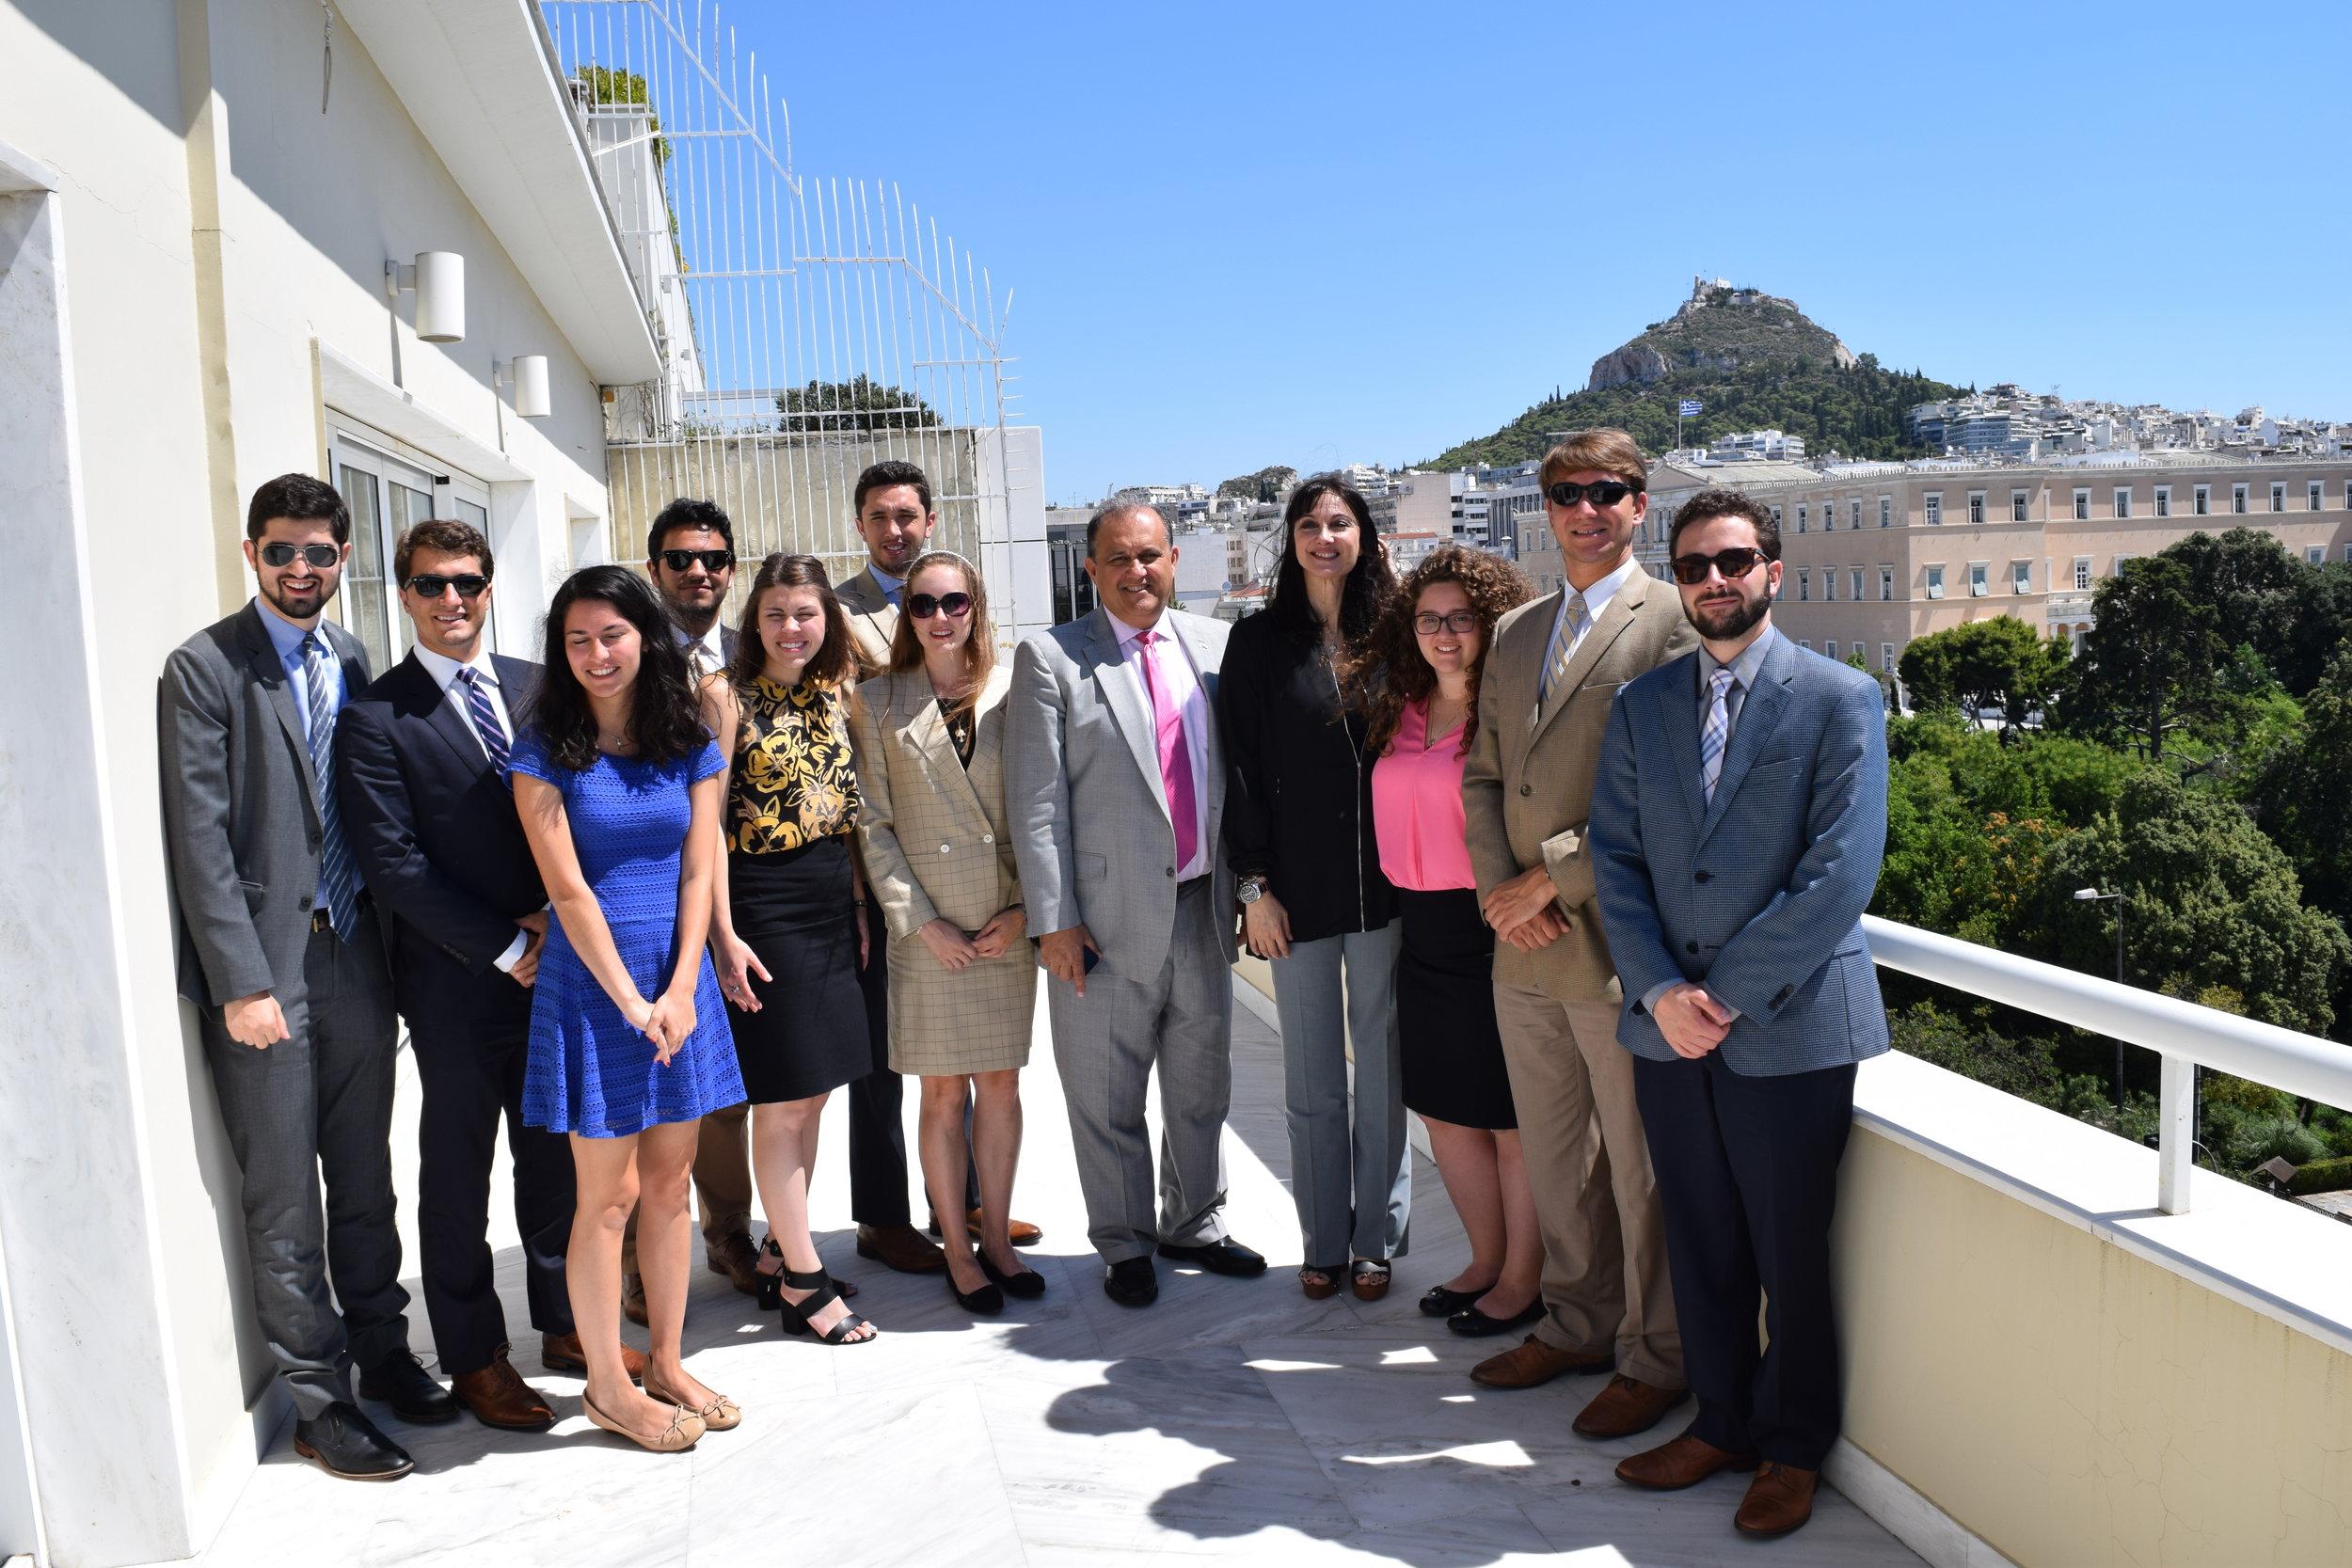 Minister of Tourism Elena Kountoura discusses US tourism to Greece with students.